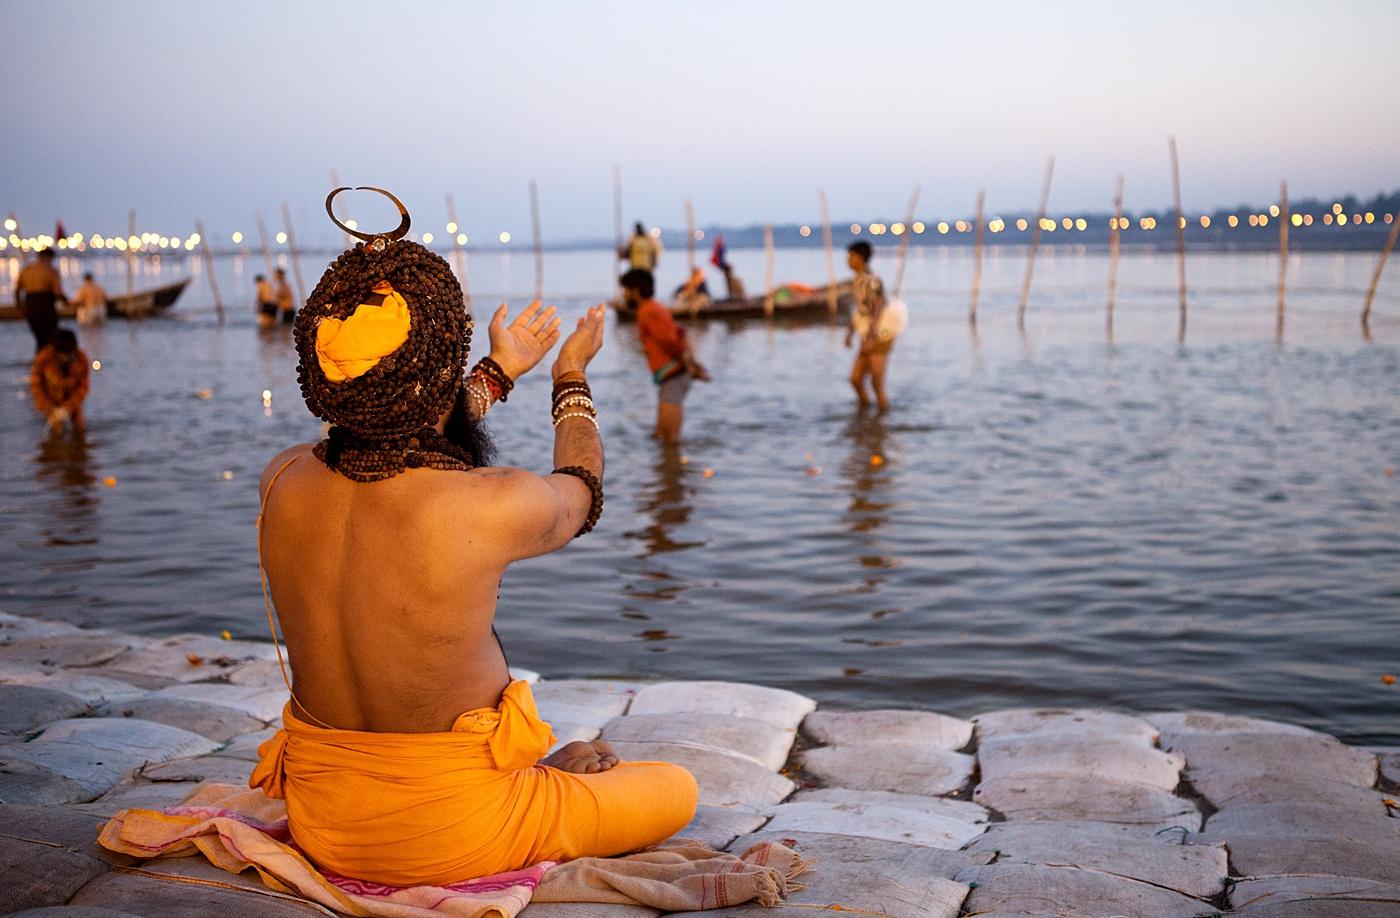 Yogis & Sadhus in Kumbh Mela